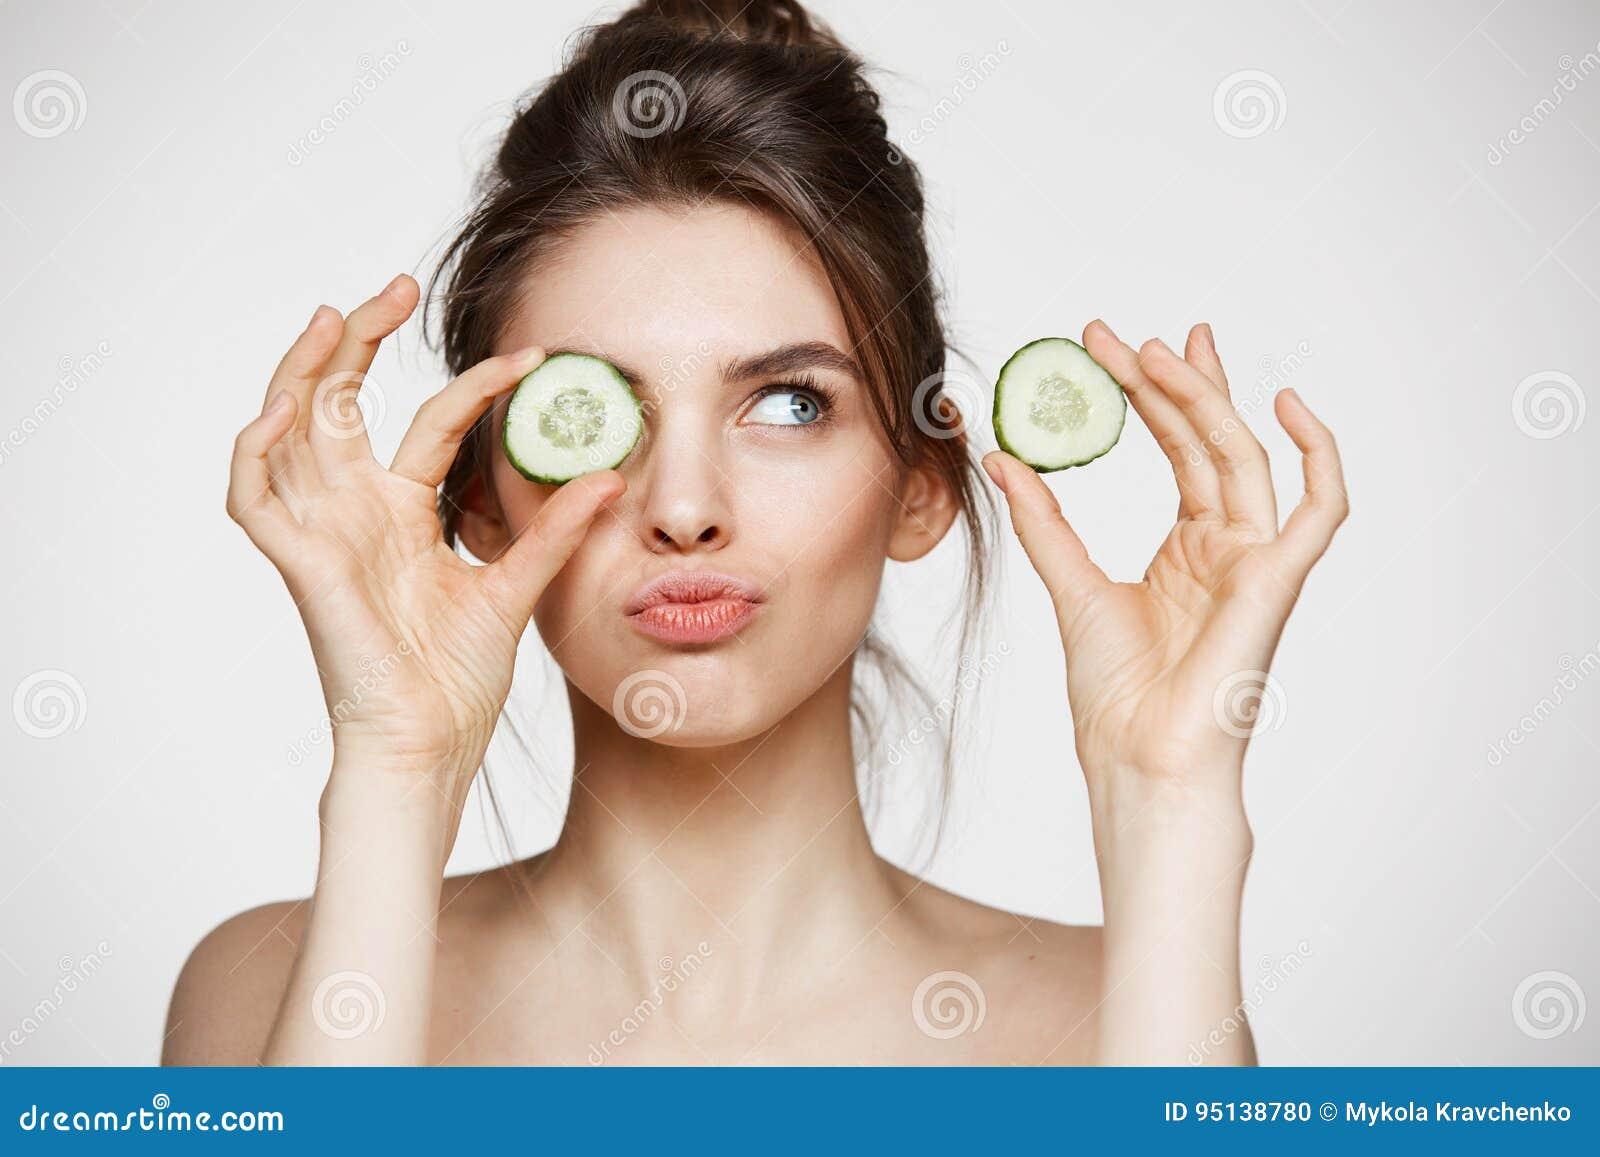 Jong mooi naakt meisje het glimlachen verbergend oog achter komkommerplak over witte achtergrond Beauty spa en de kosmetiek